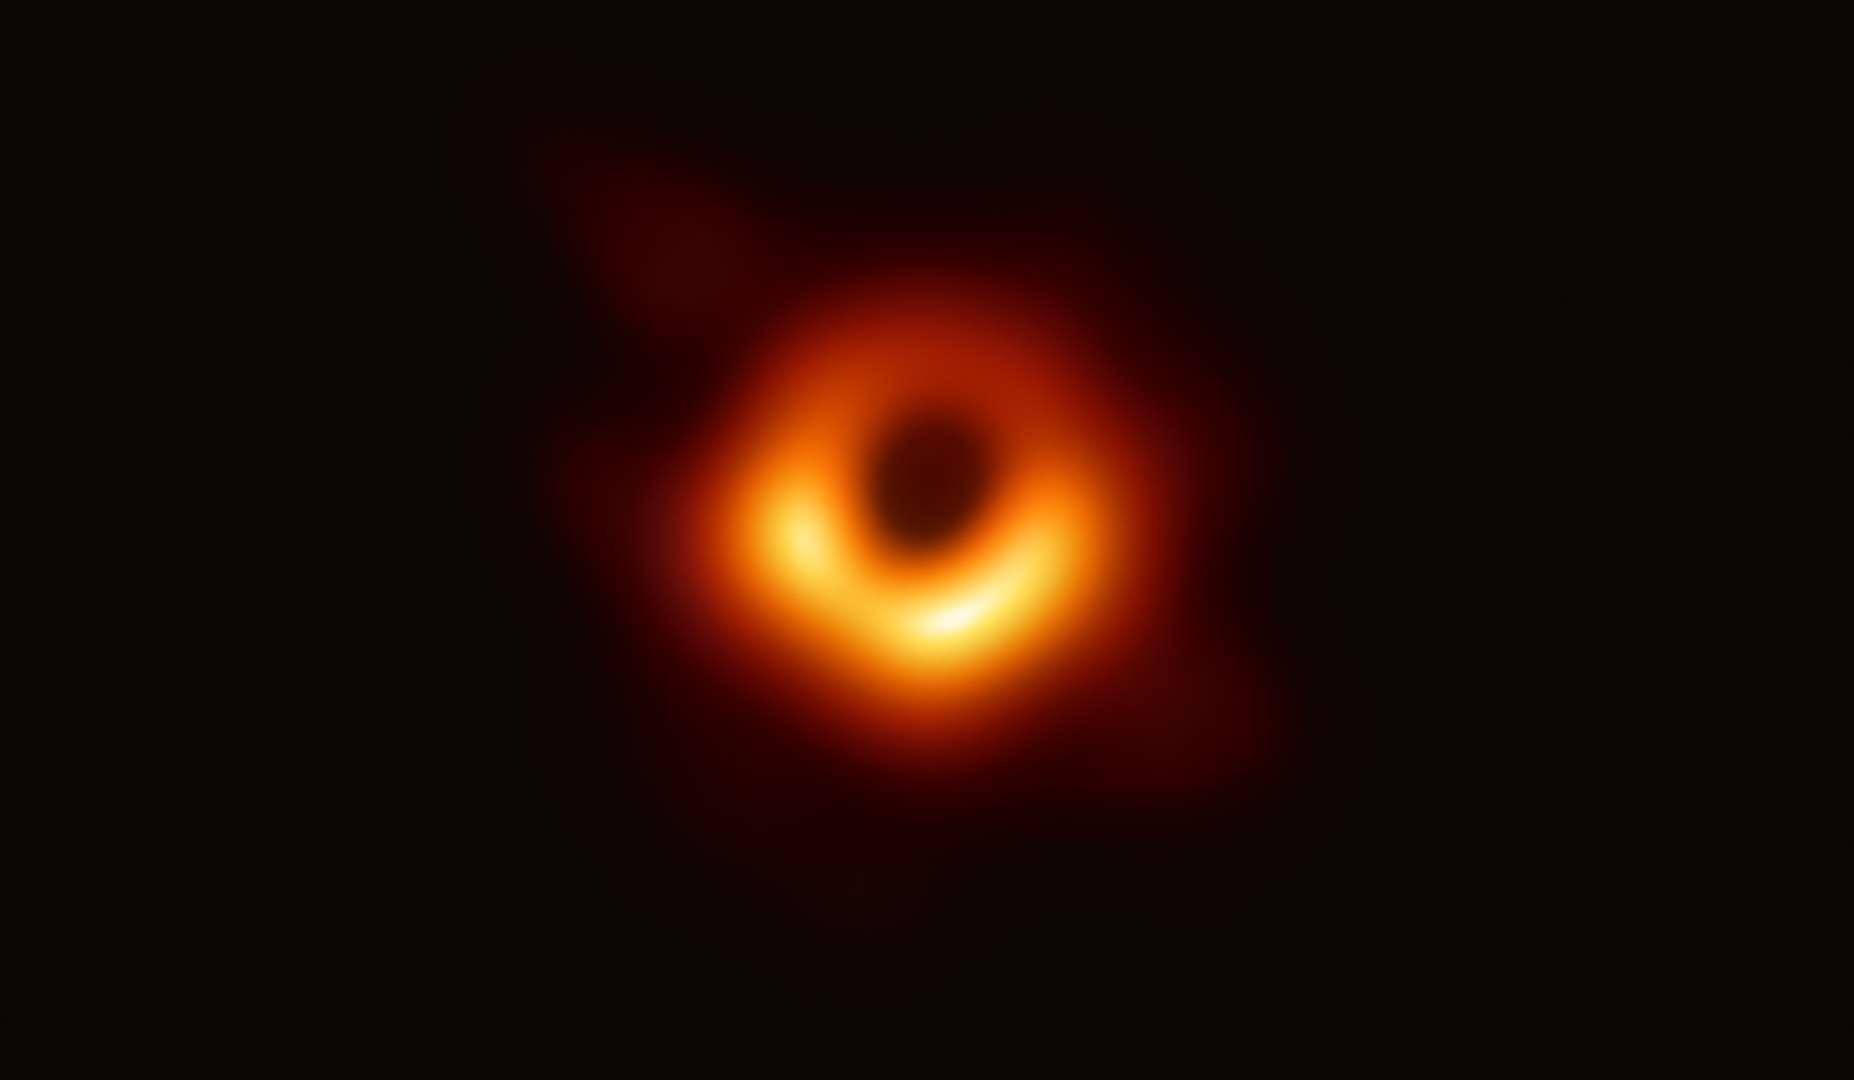 【天文壁】First Image of a Black Hole-小柚妹站